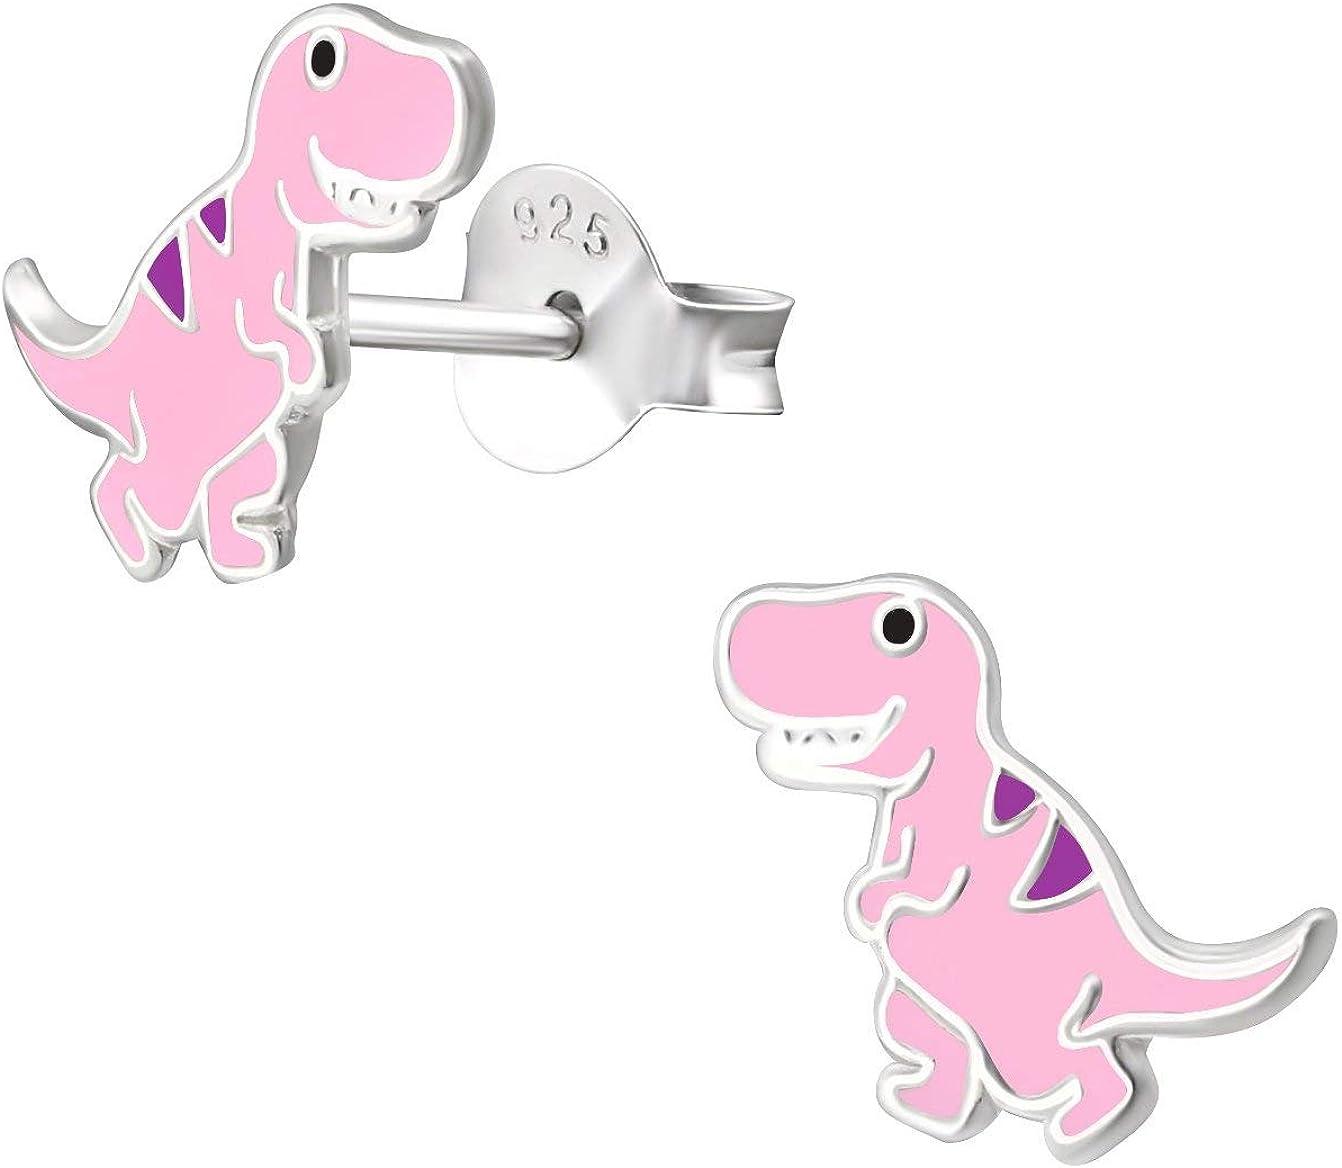 Hypoallergenic Sterling Silver Little Dinosaur Stud Earrings for Kids Nickel Free